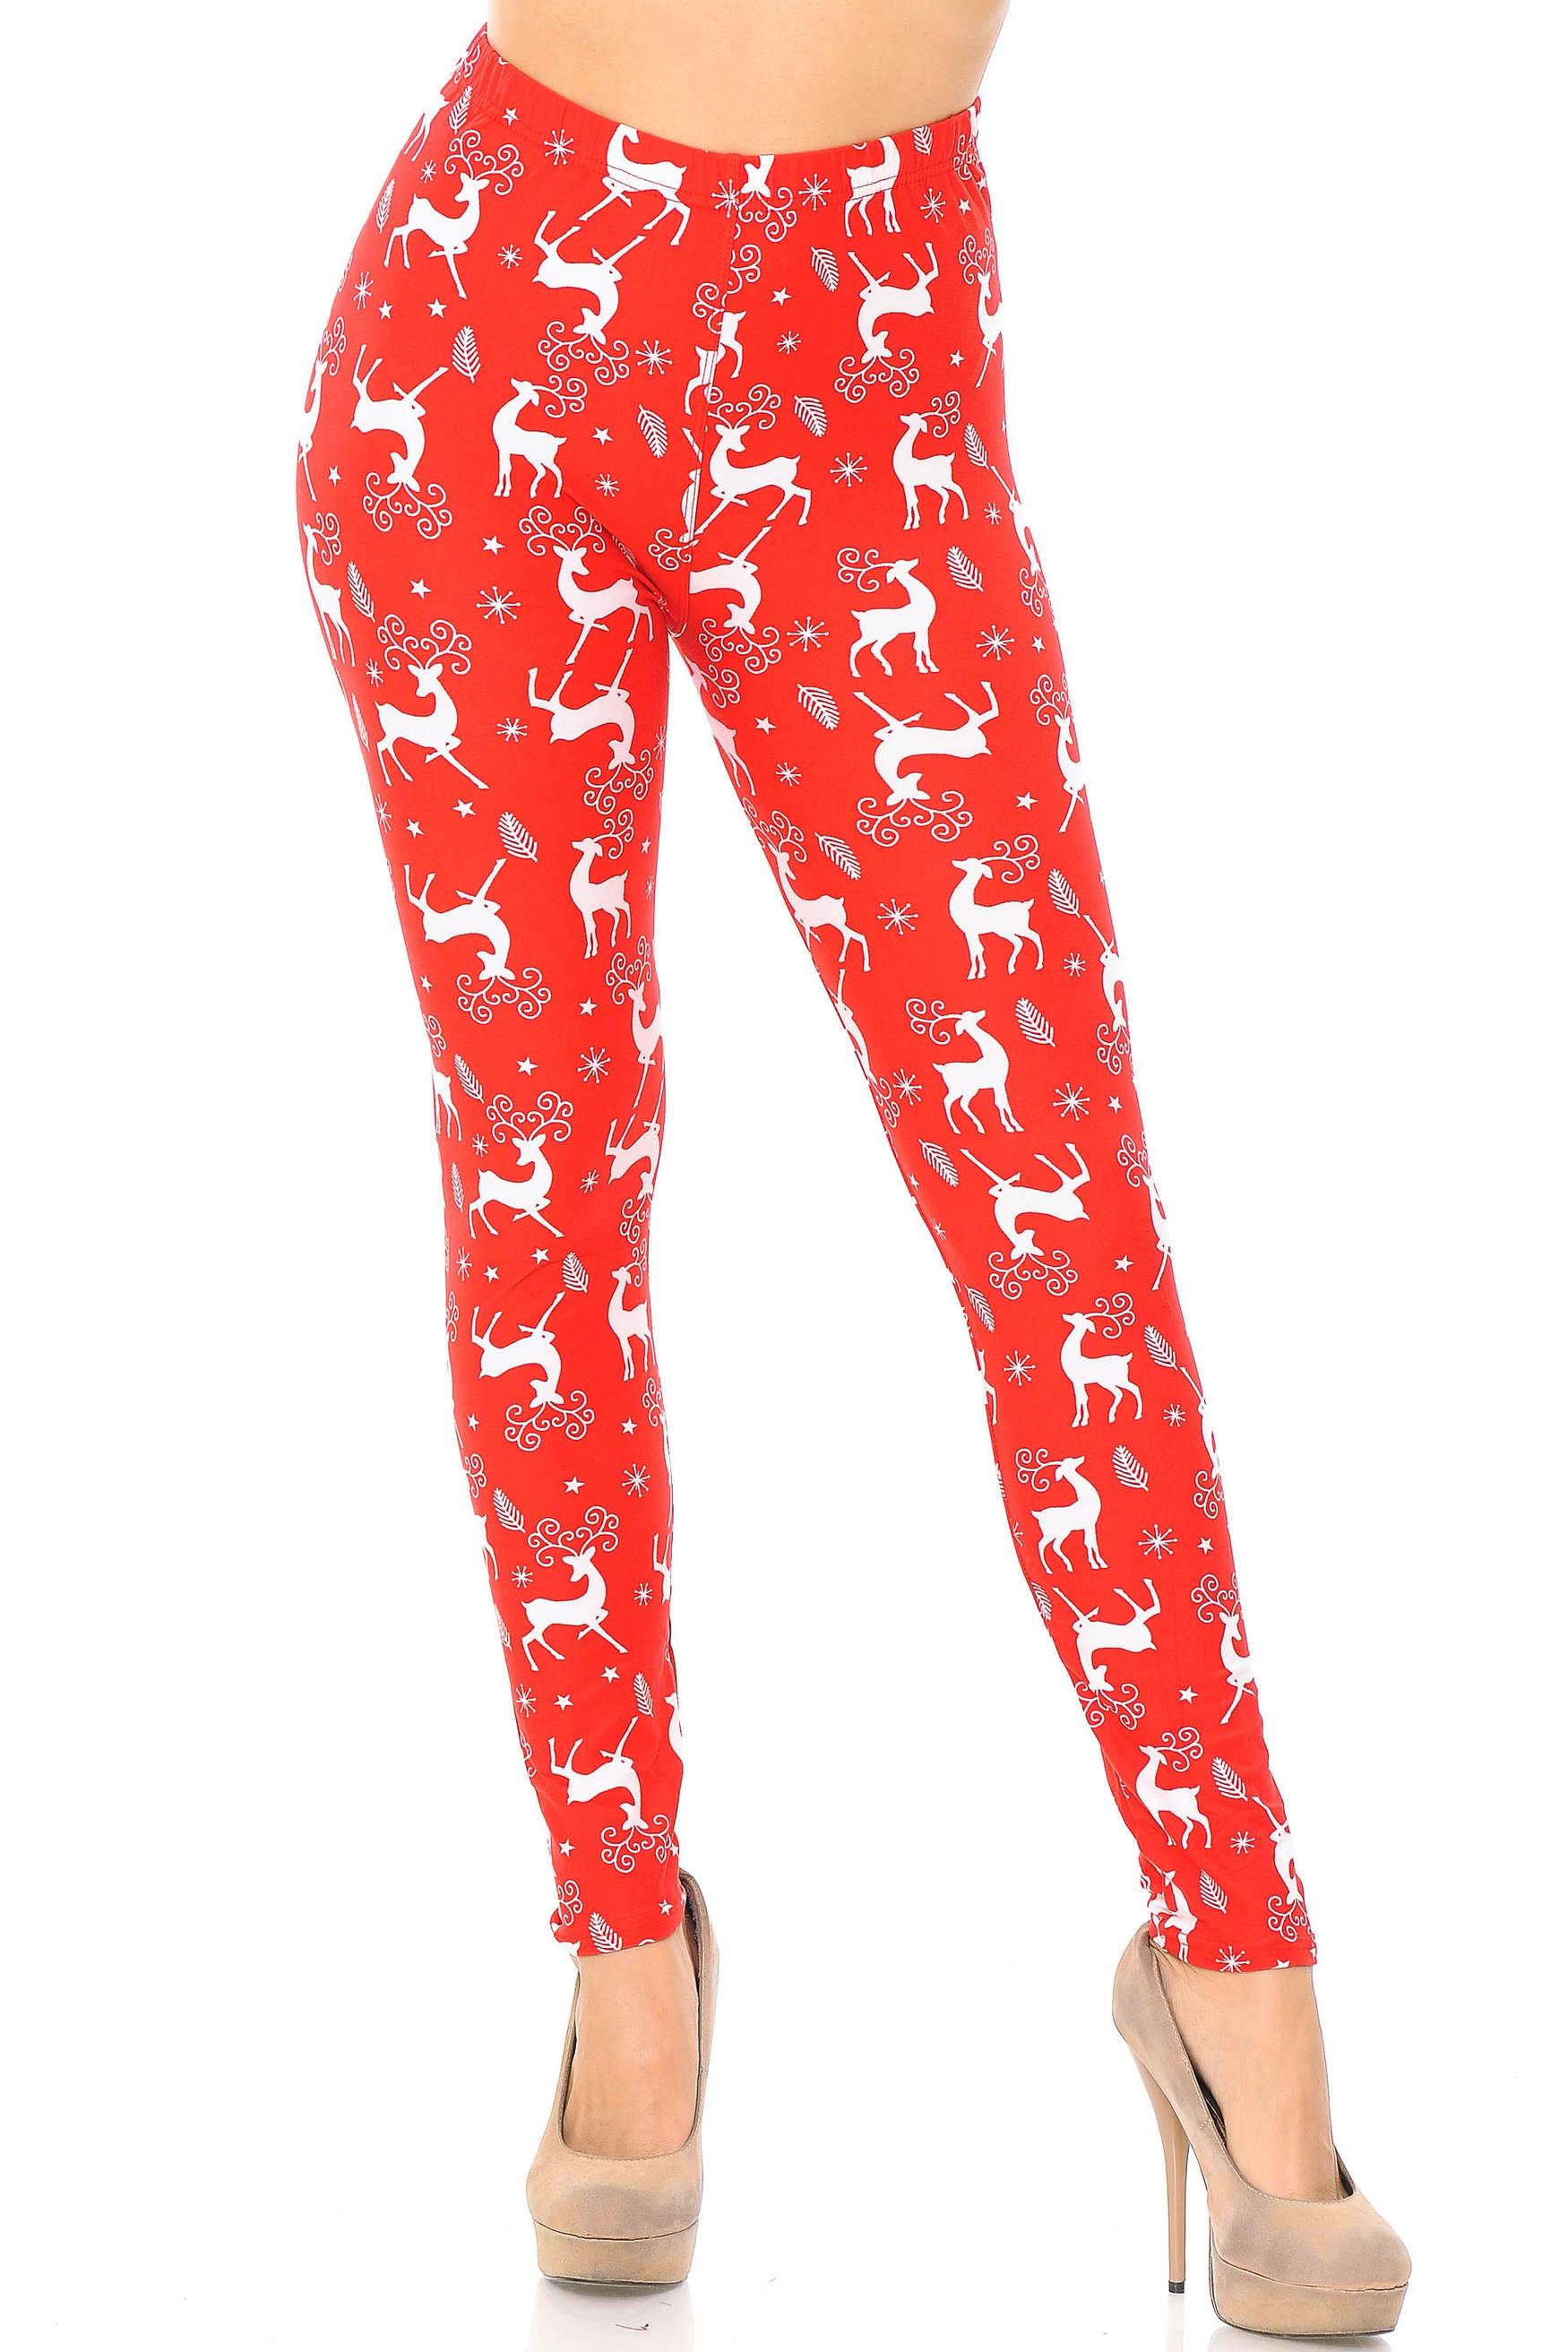 Brushed Prancing Christmas Reindeer Extra Plus Size Leggings - 3X-5X